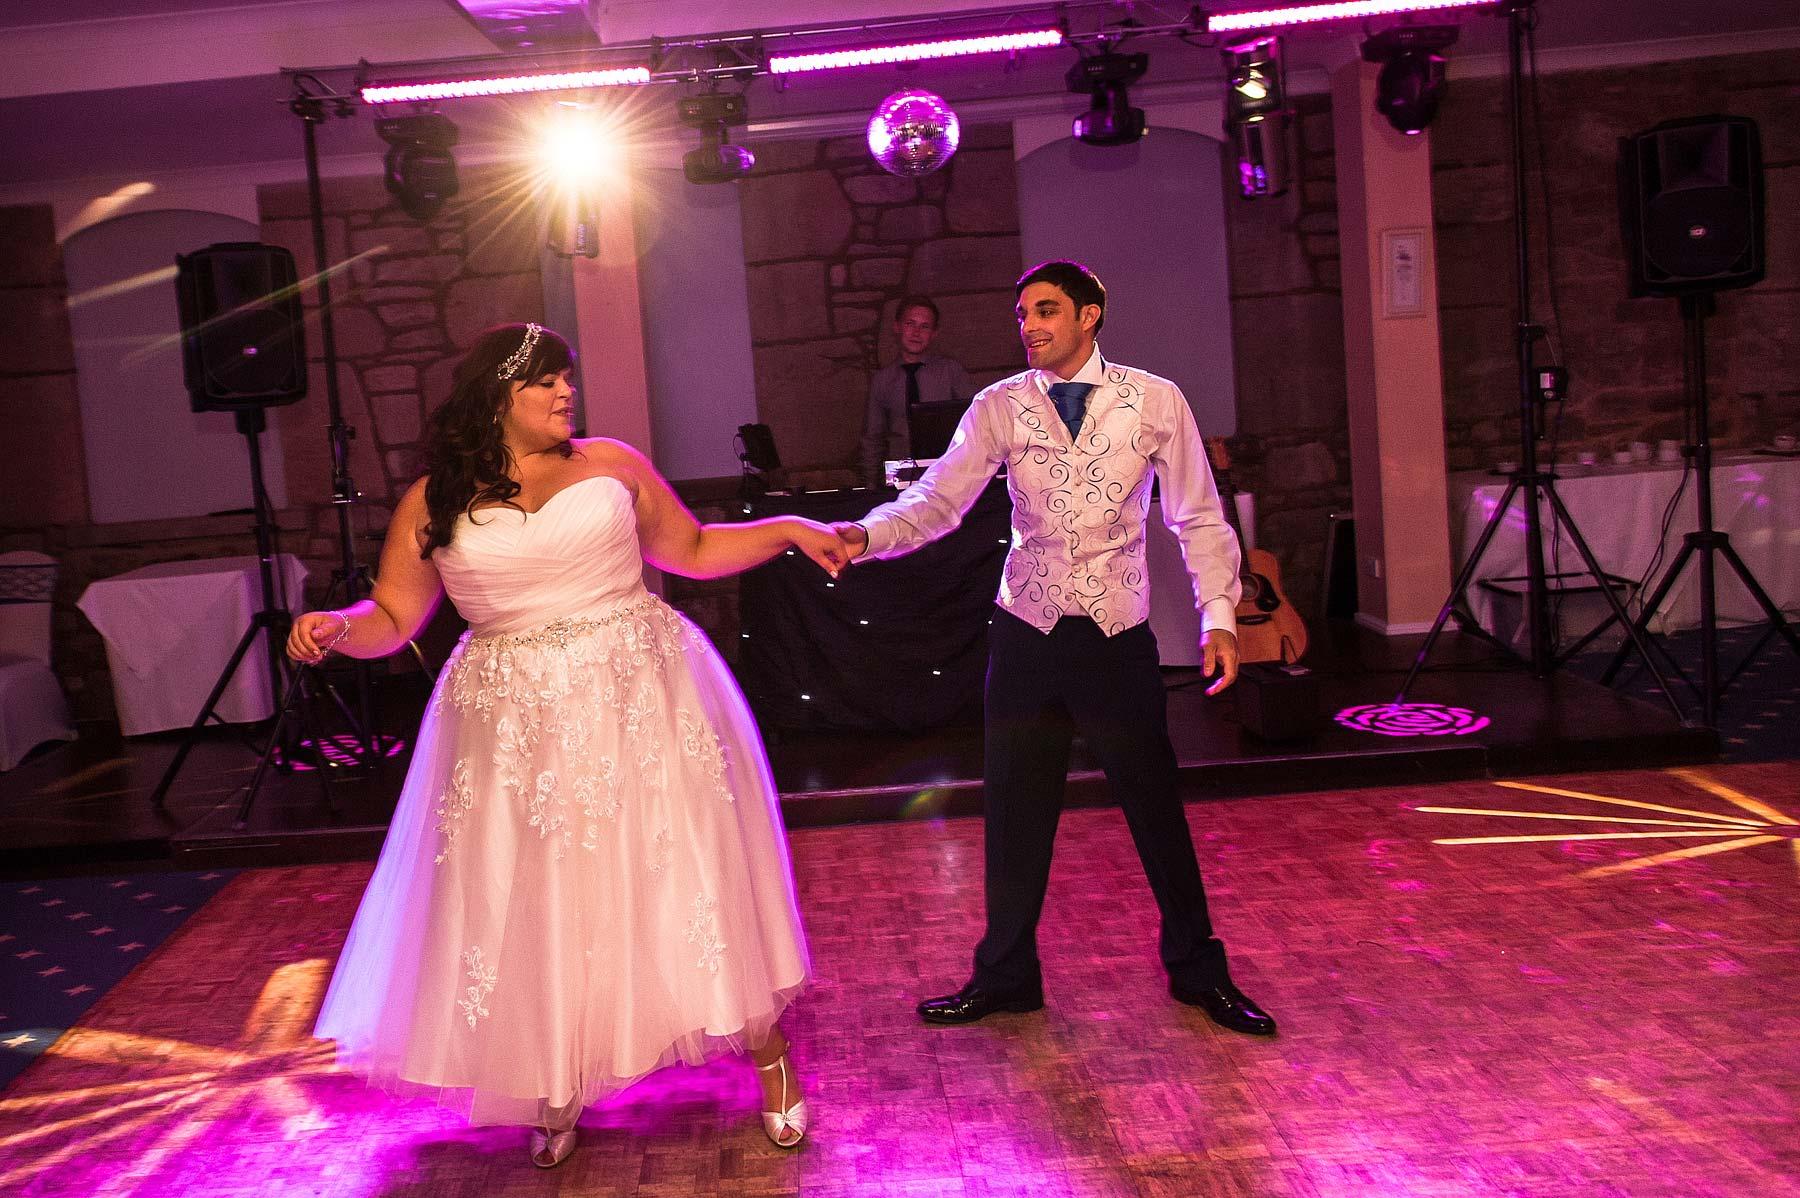 berry-head-hotel-brixham-wedding-photographer-102